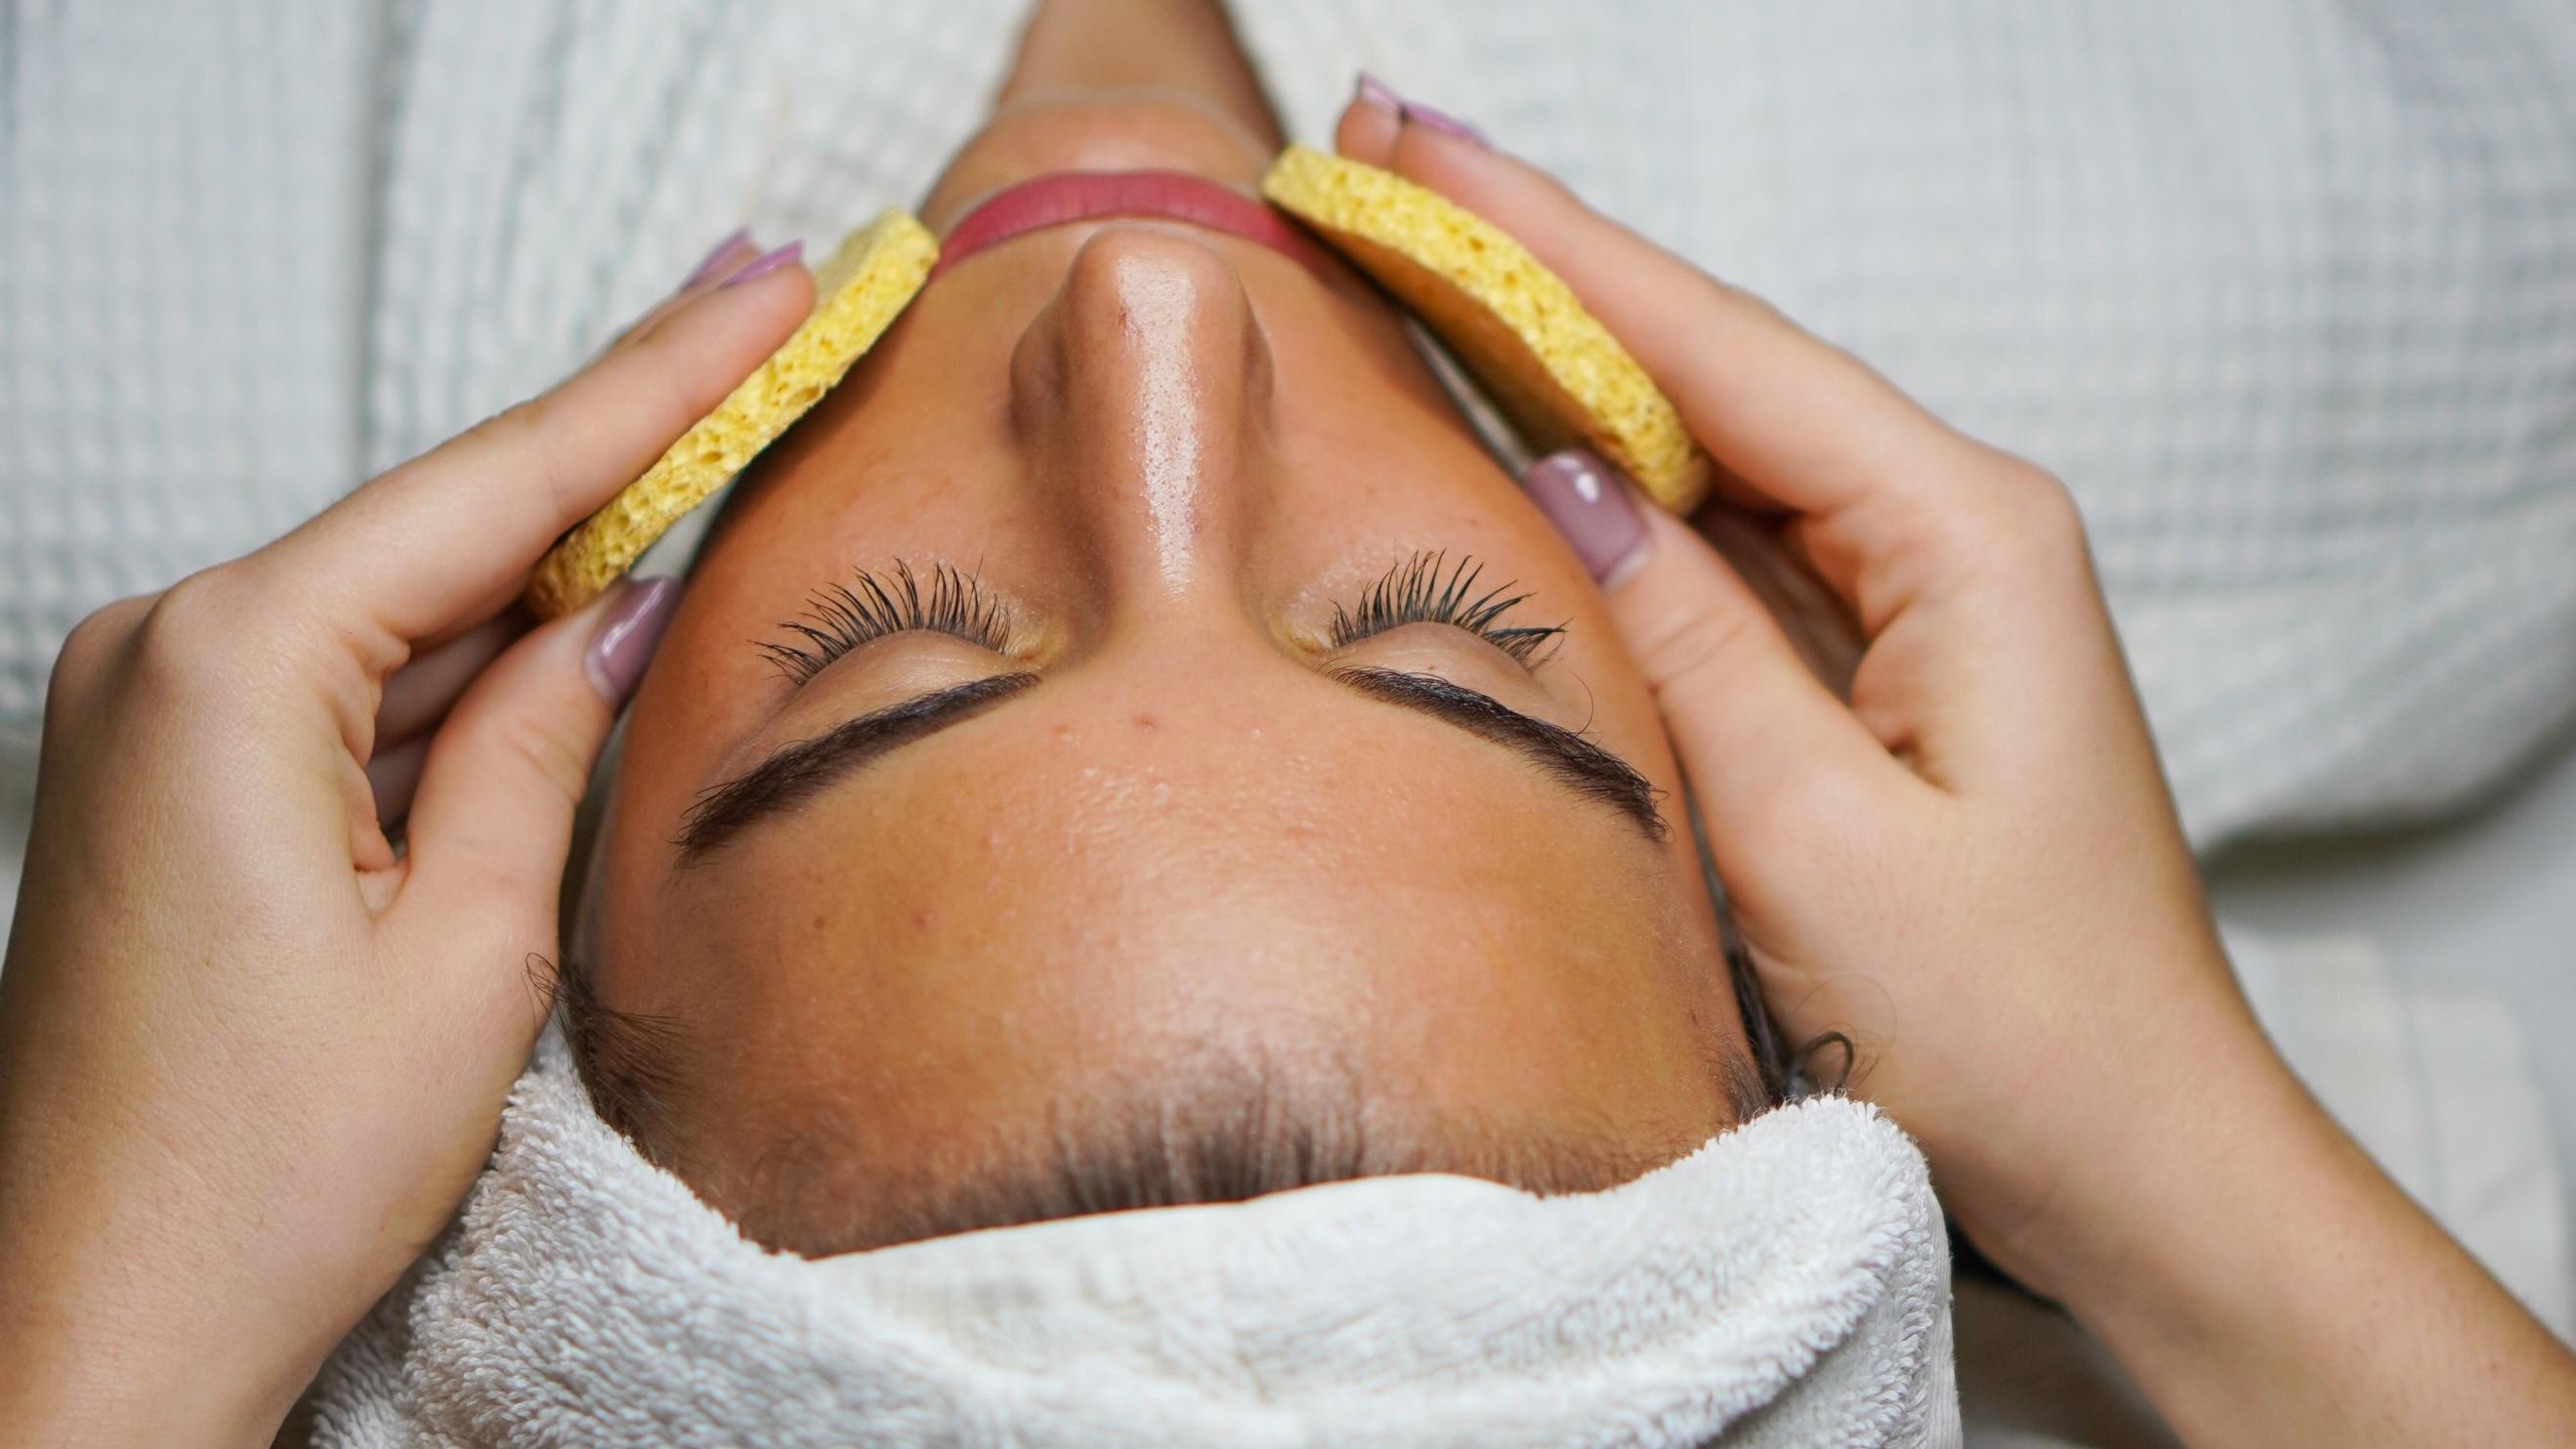 Golden care beauty center